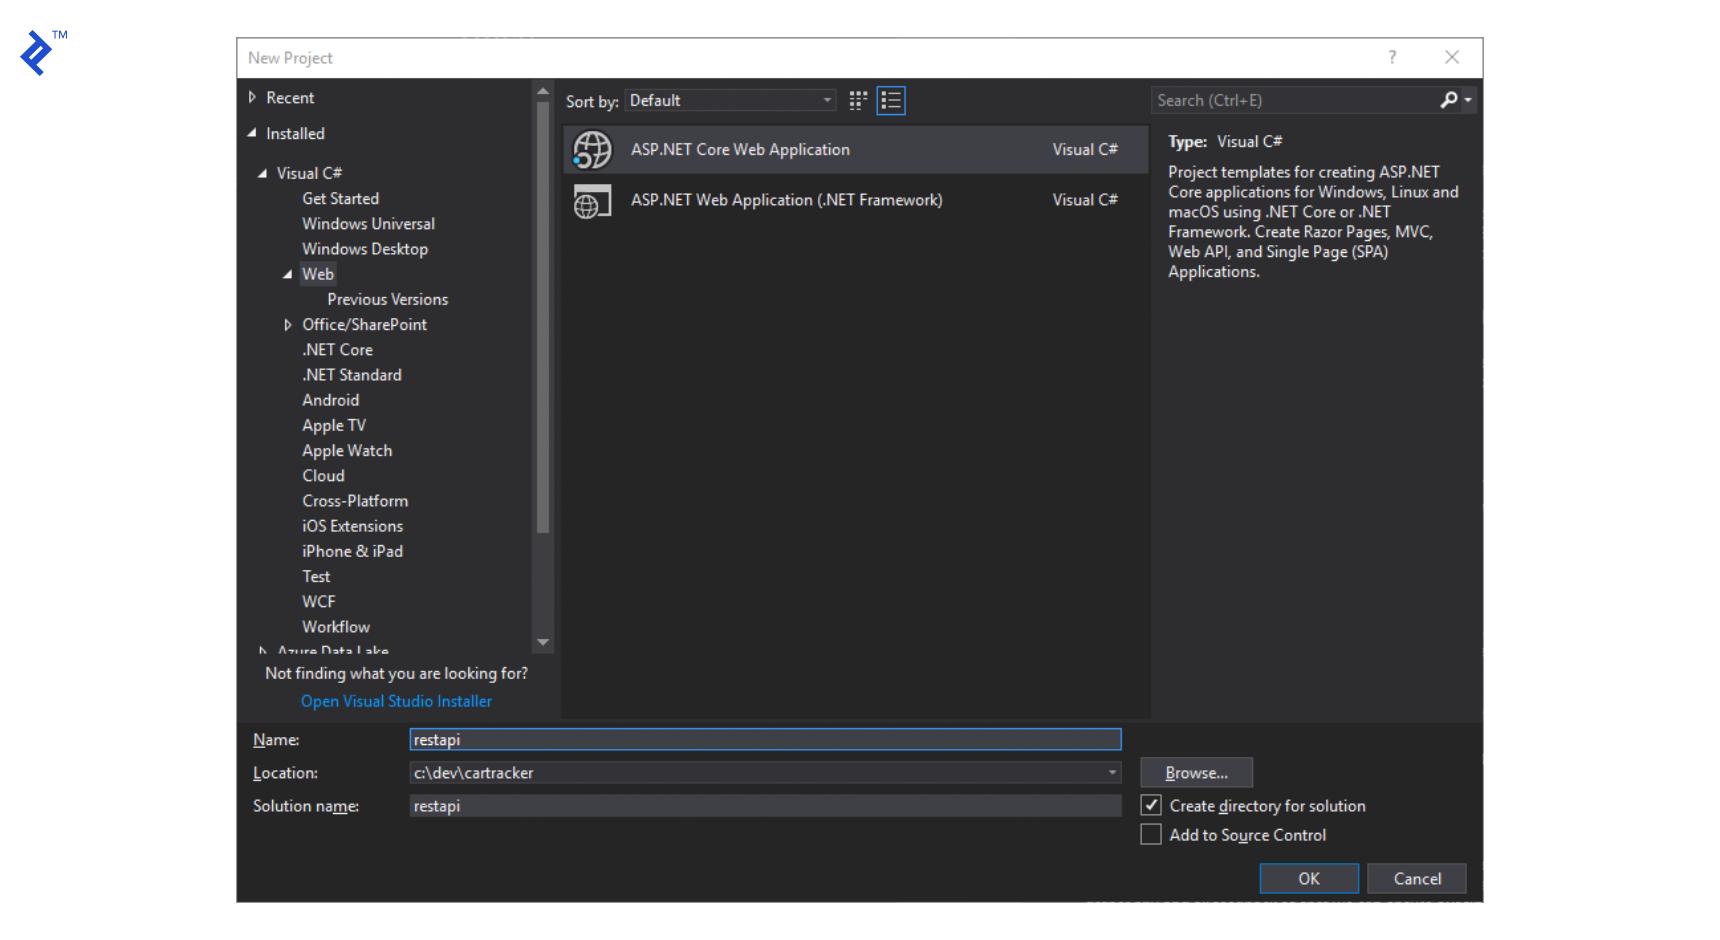 wpf reactiveui: New visual studio ASP.NET Core web application